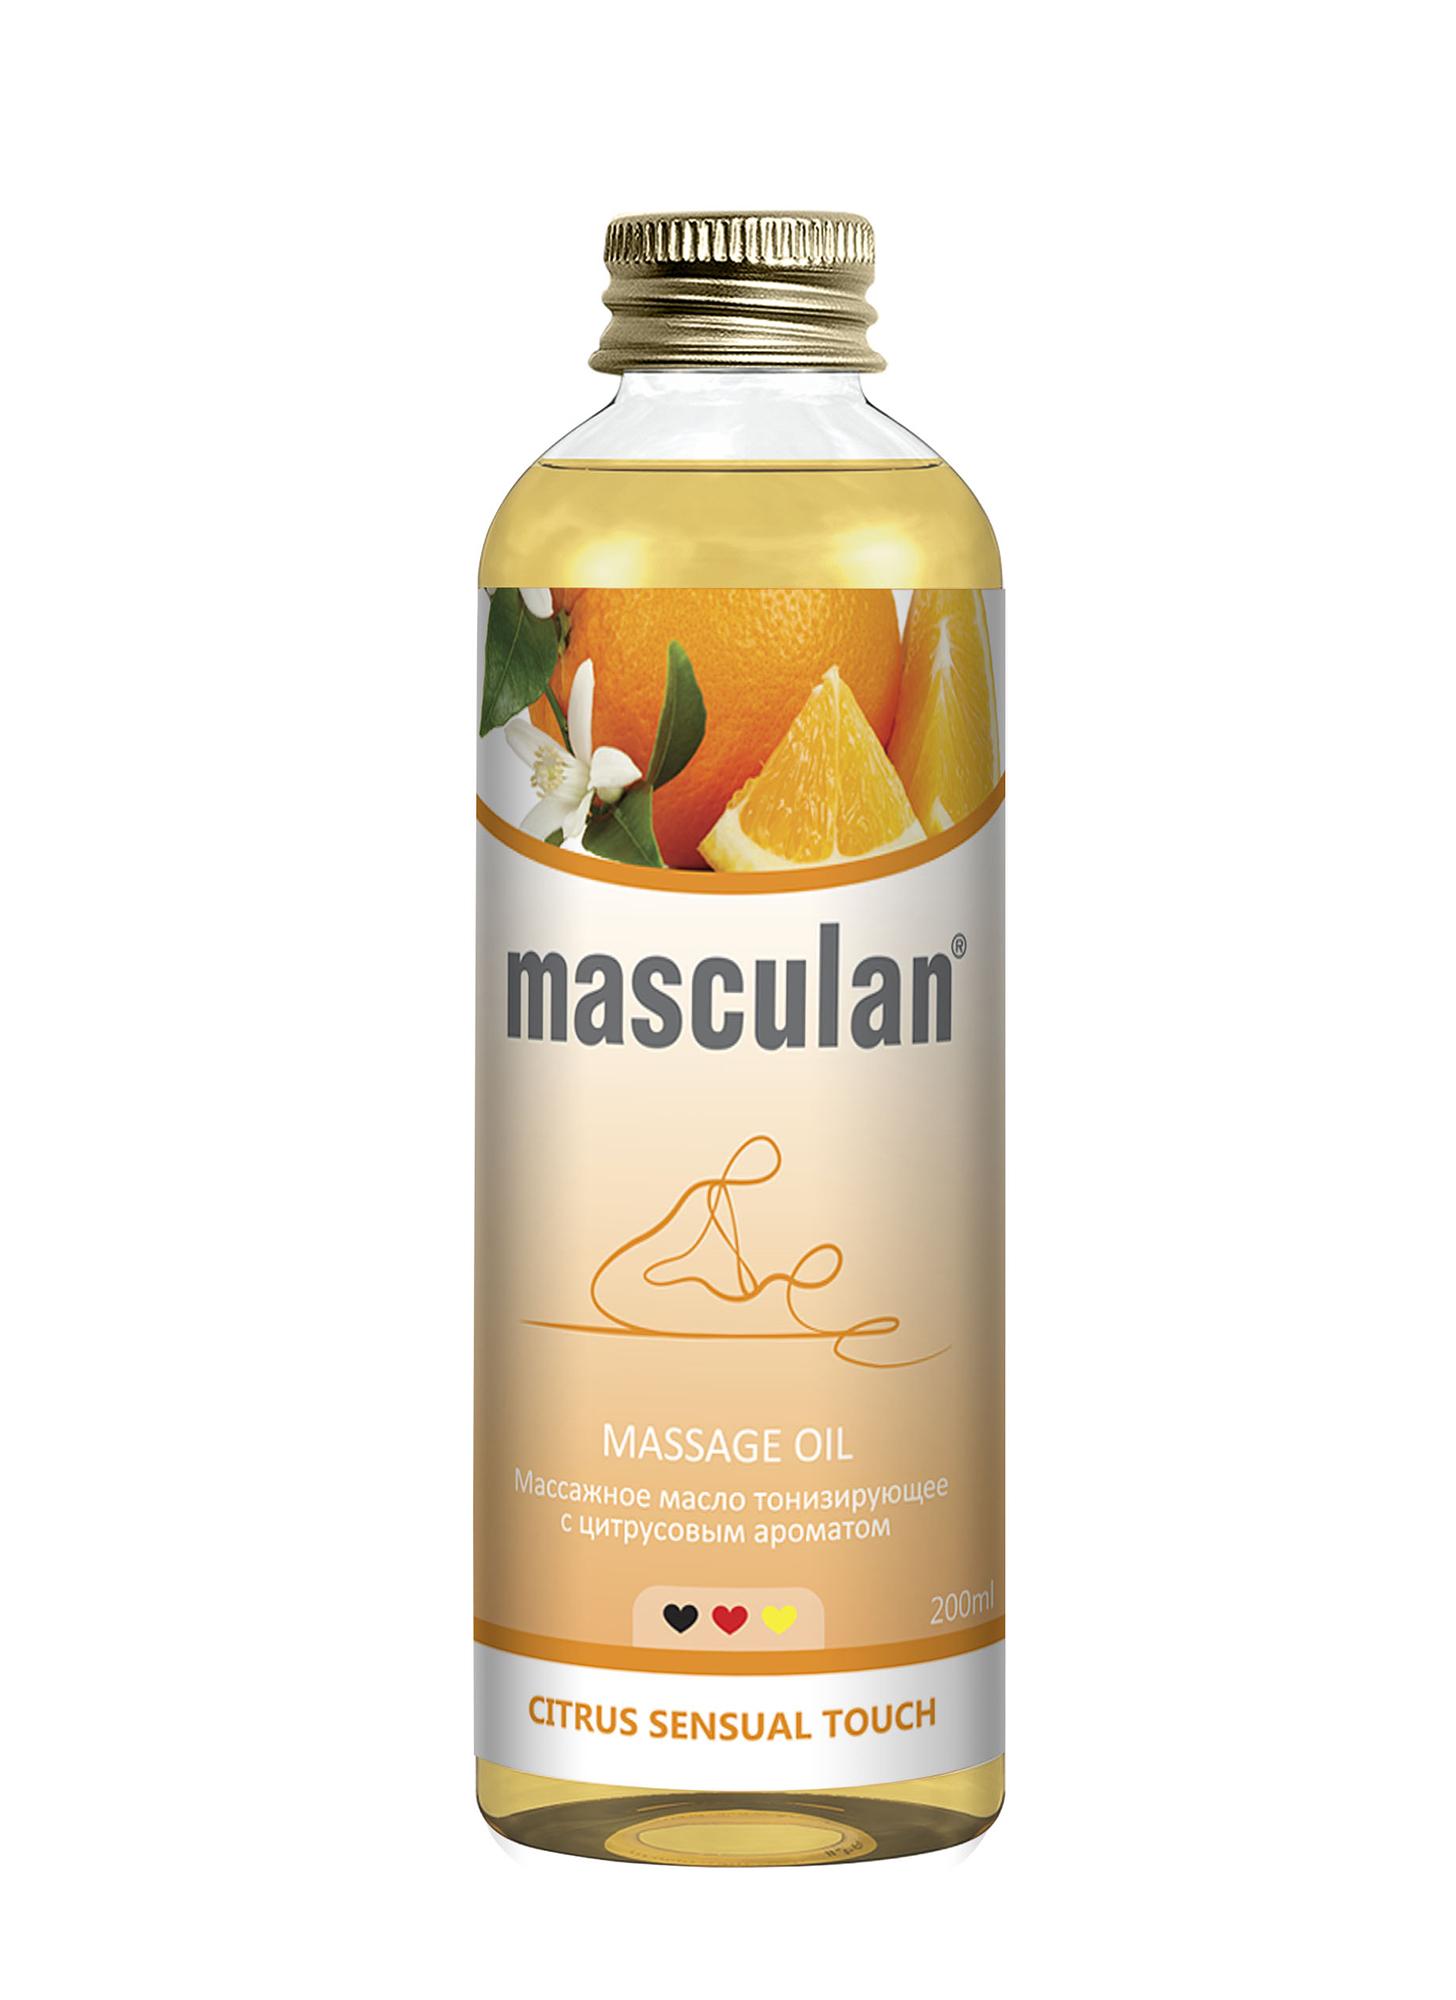 Massage oil Citrus sensual touch